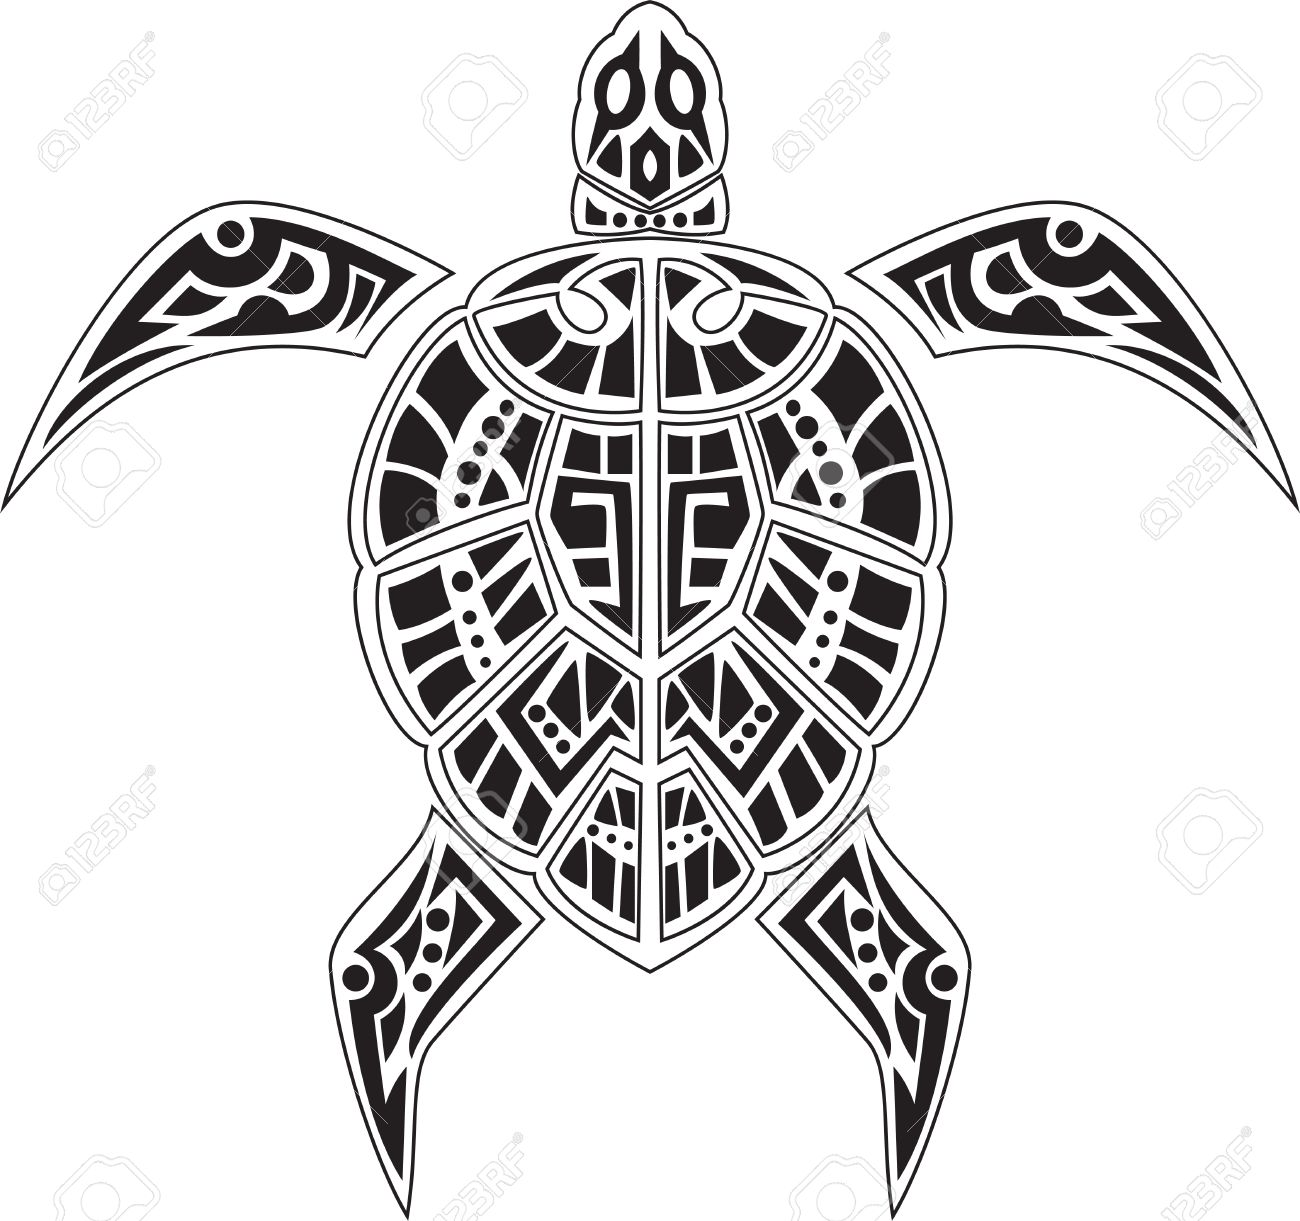 turtles tatto for you design - 44559304